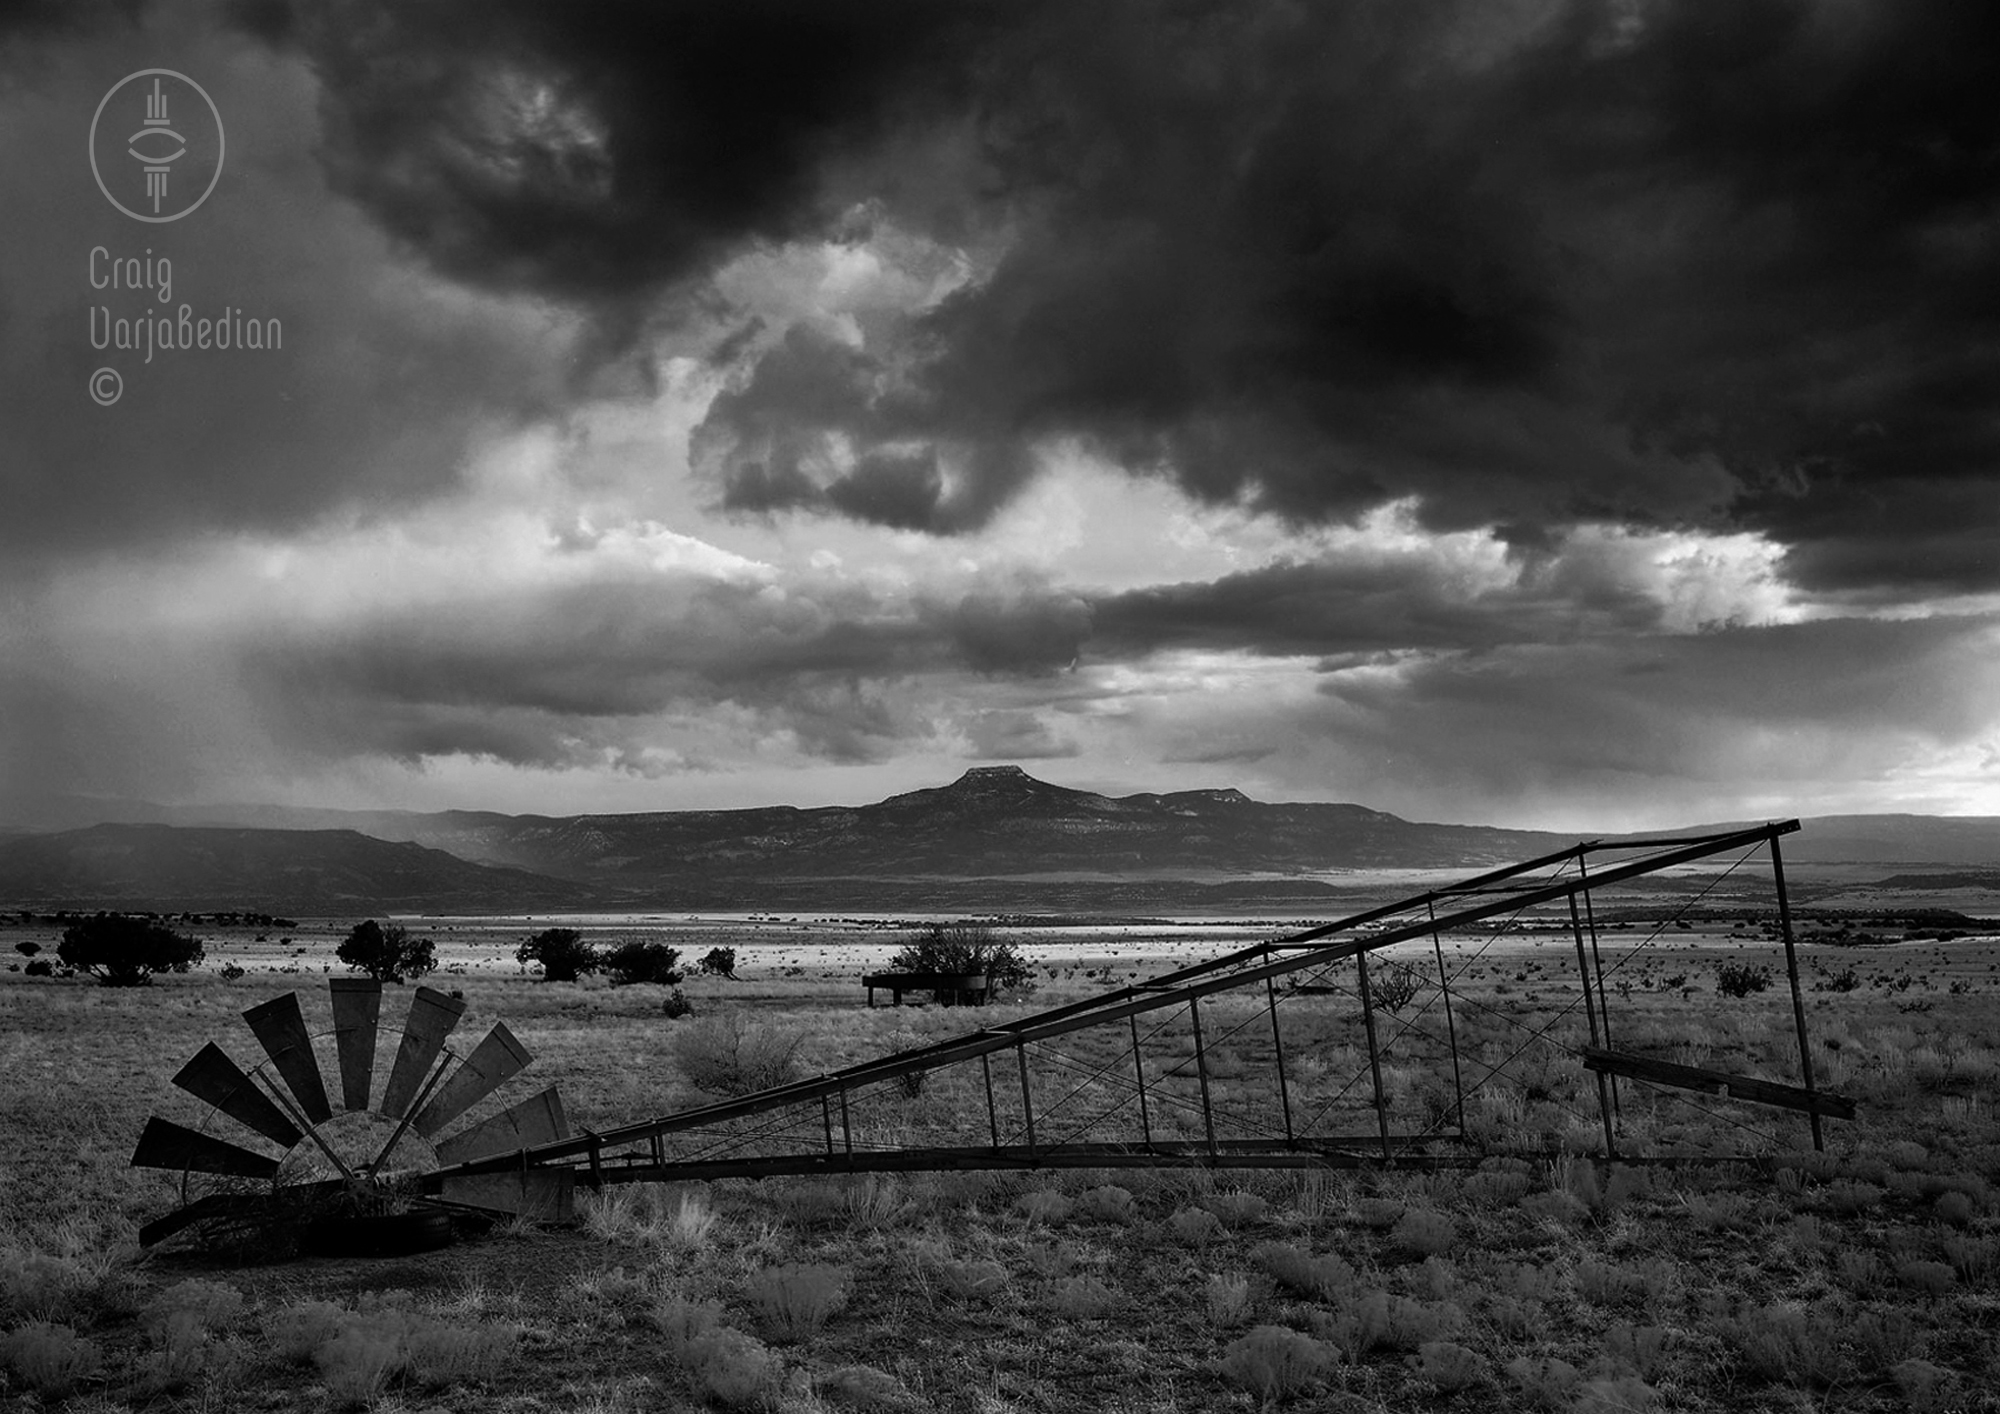 Fallen-Windmill-©Craig Varjabedian.jpg